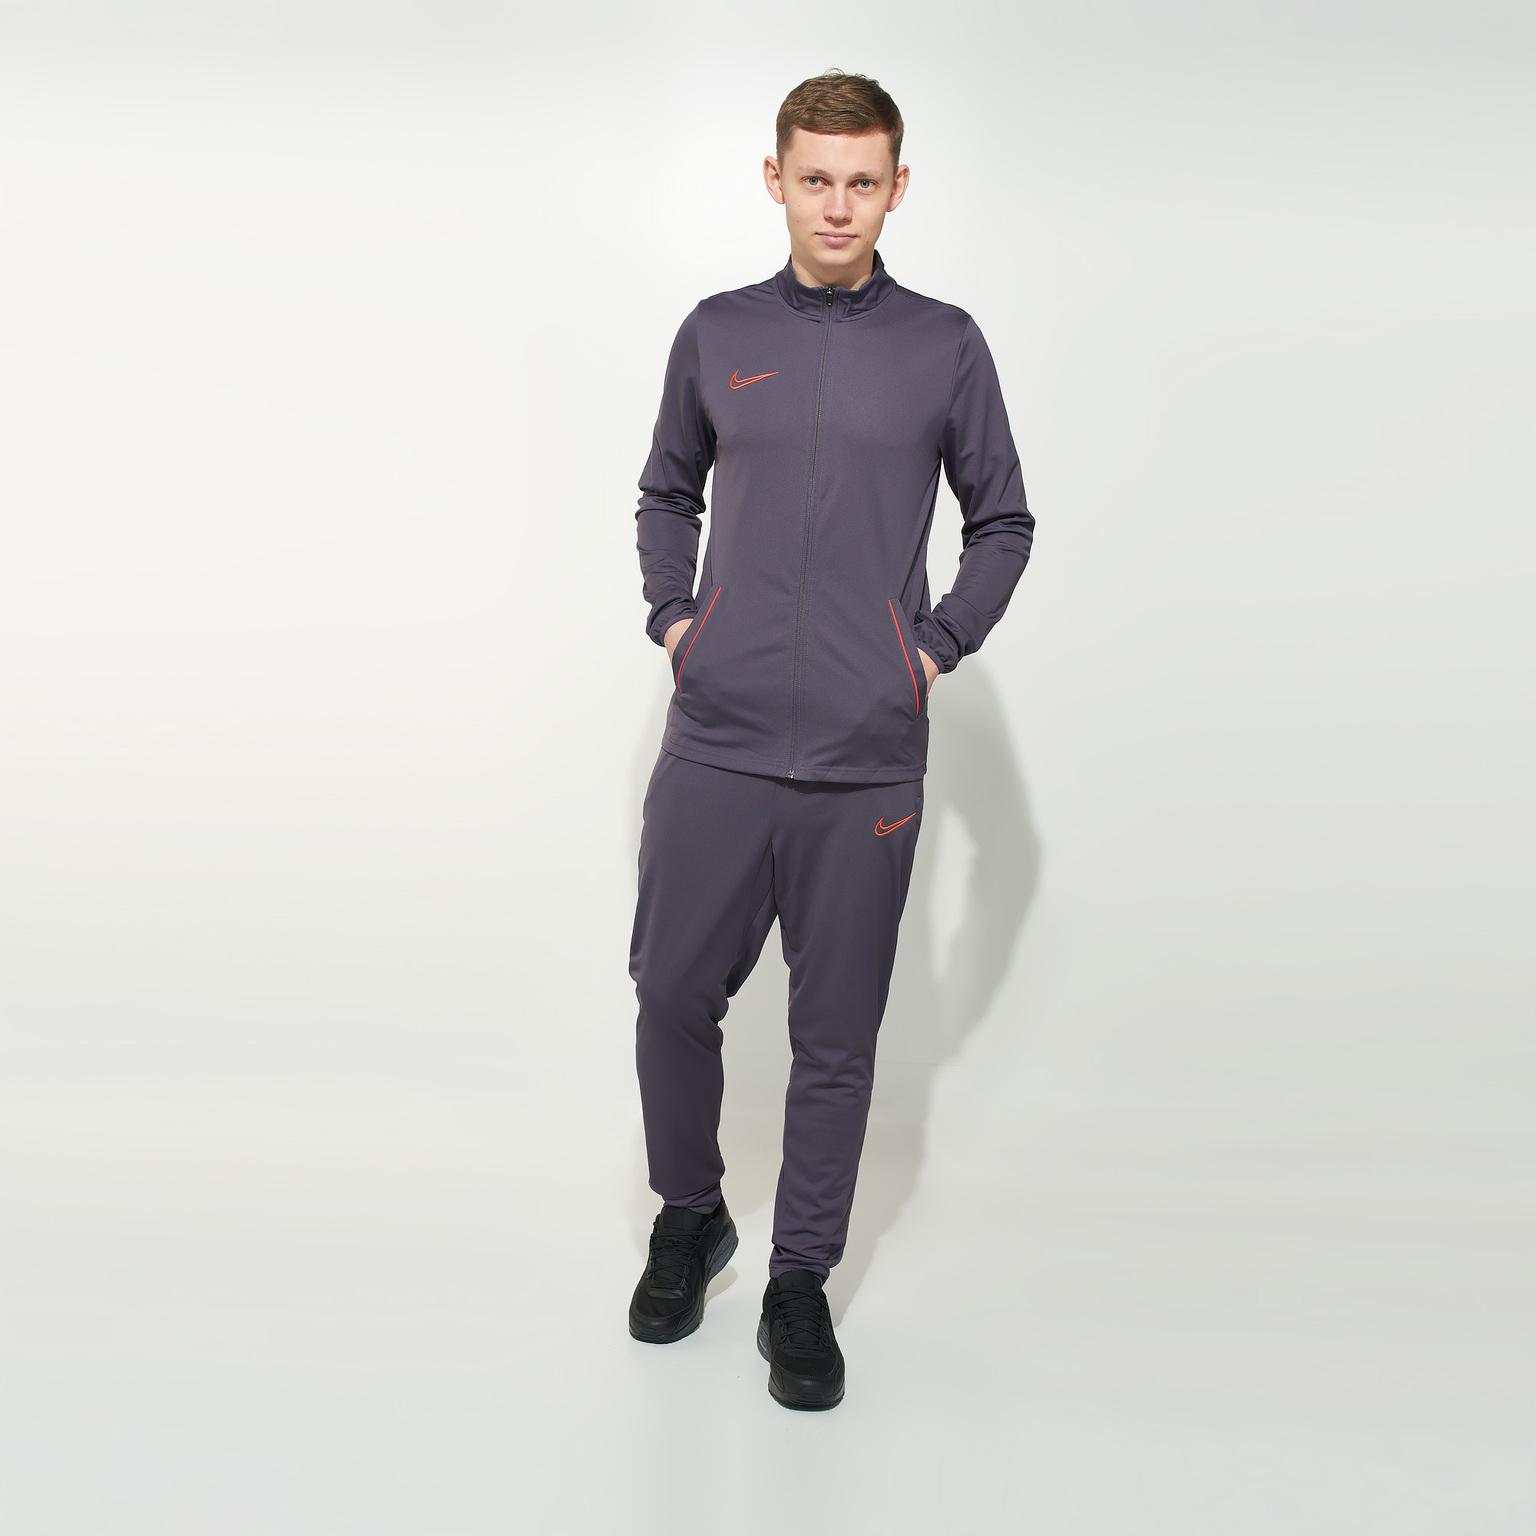 Костюм спортивный Nike Academy21 CW6131-573 костюм спортивный nike spe fleece suit bv3017 058